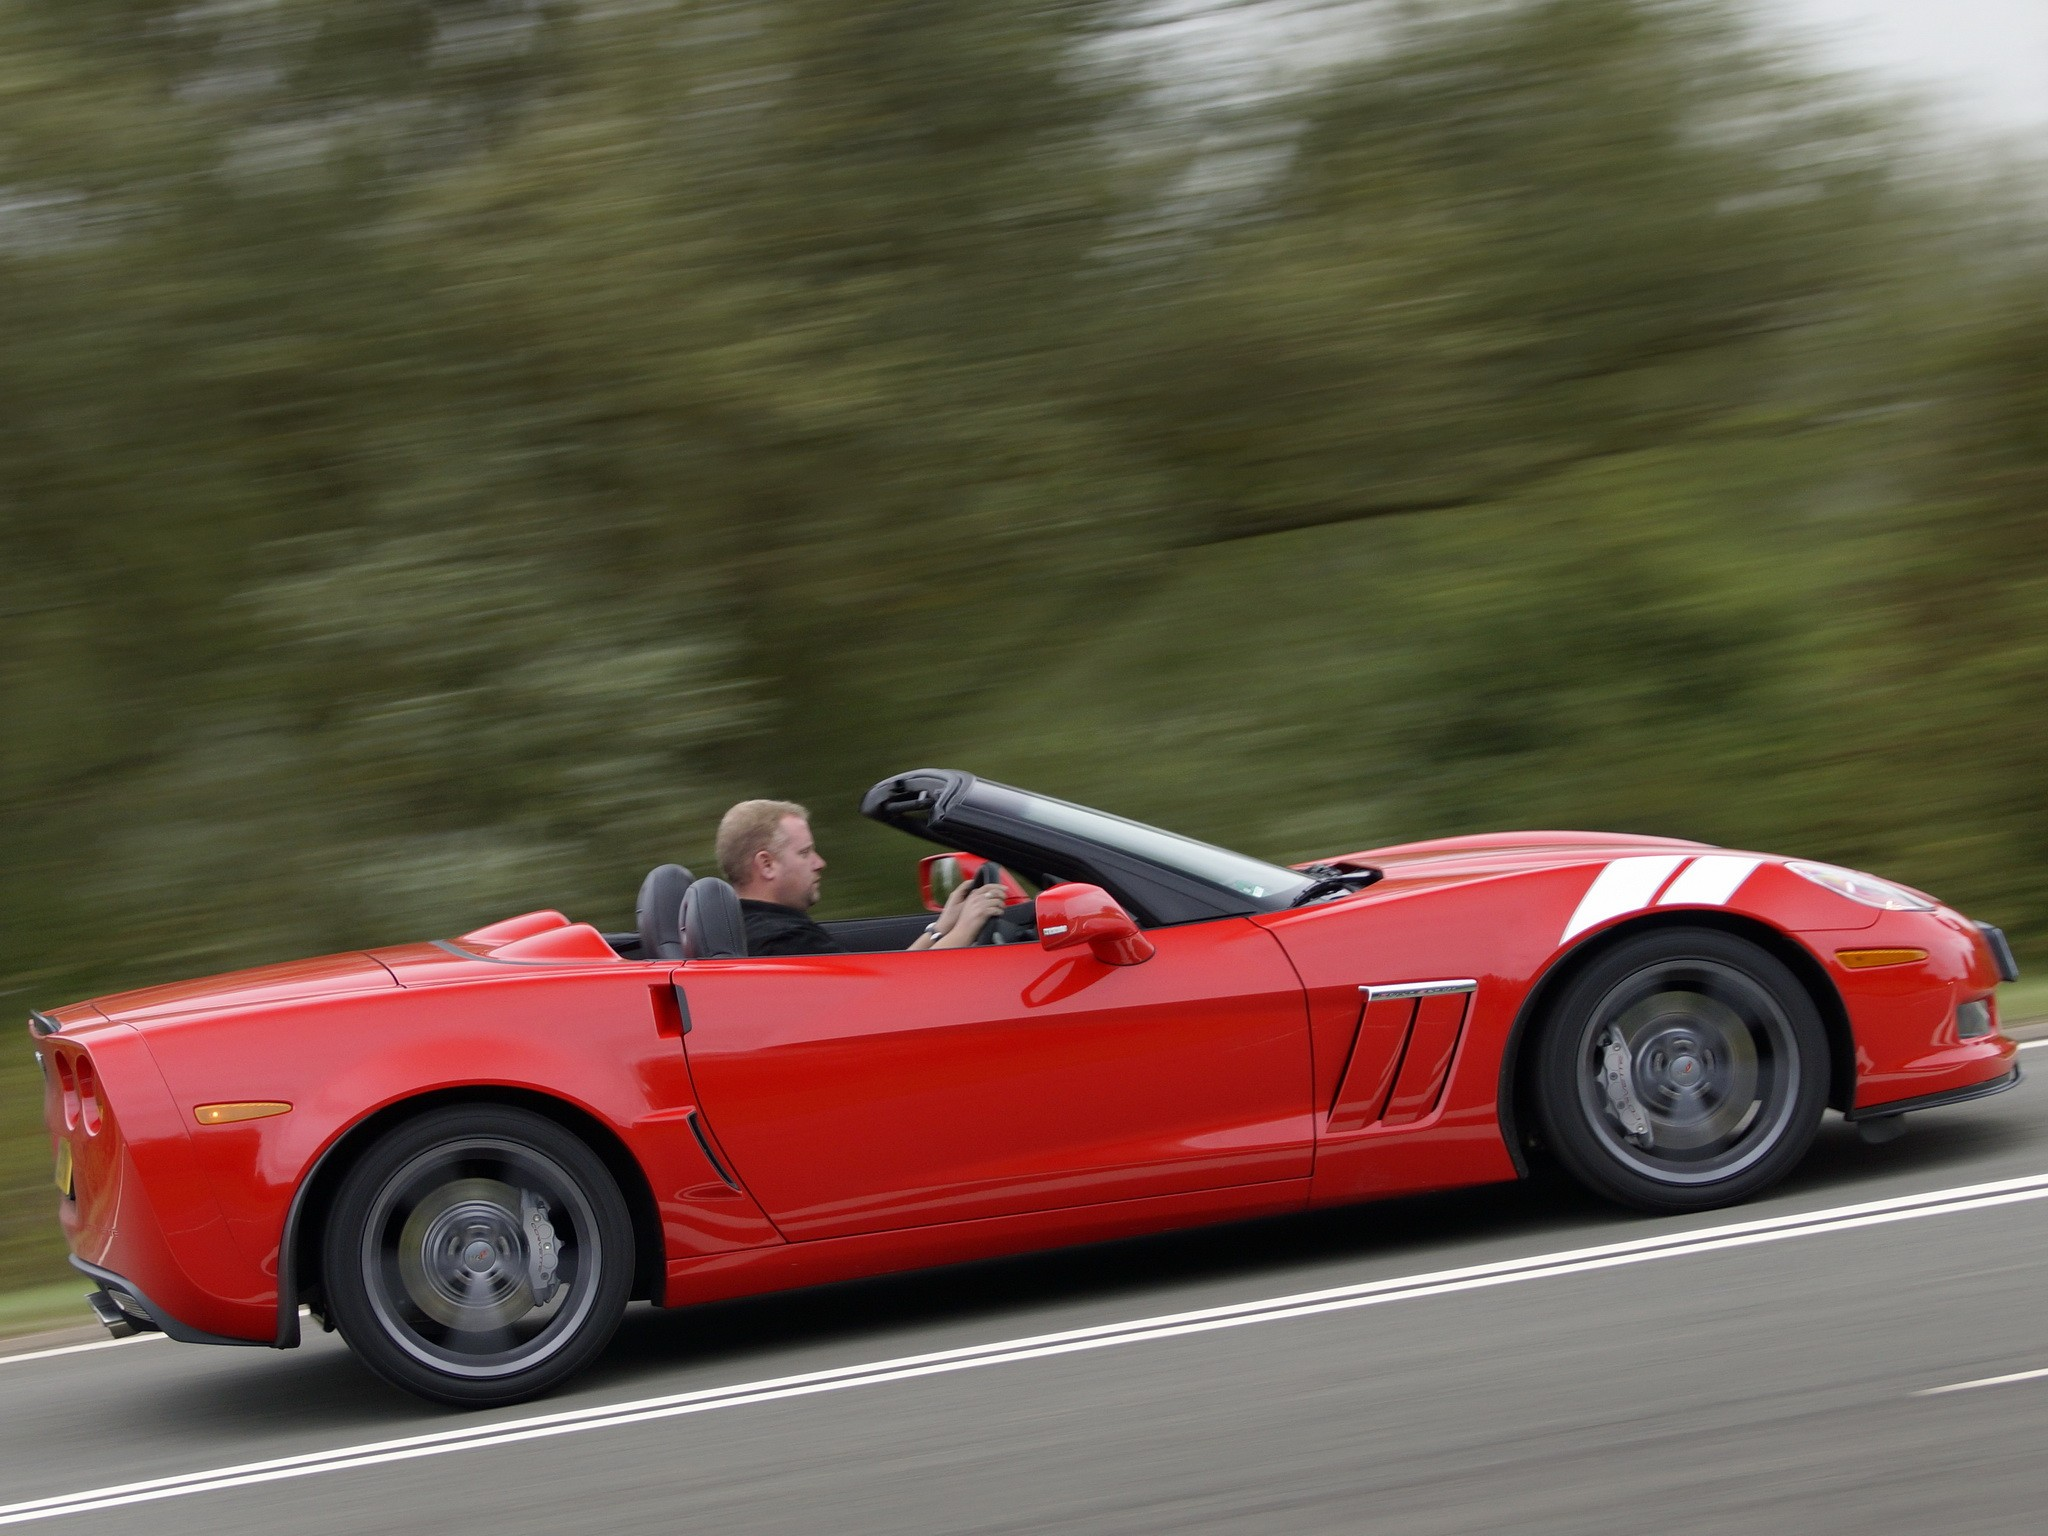 National Corvette Museum >> CHEVROLET Corvette Convertible Grand Sport - 2009, 2010, 2011, 2012, 2013 - autoevolution